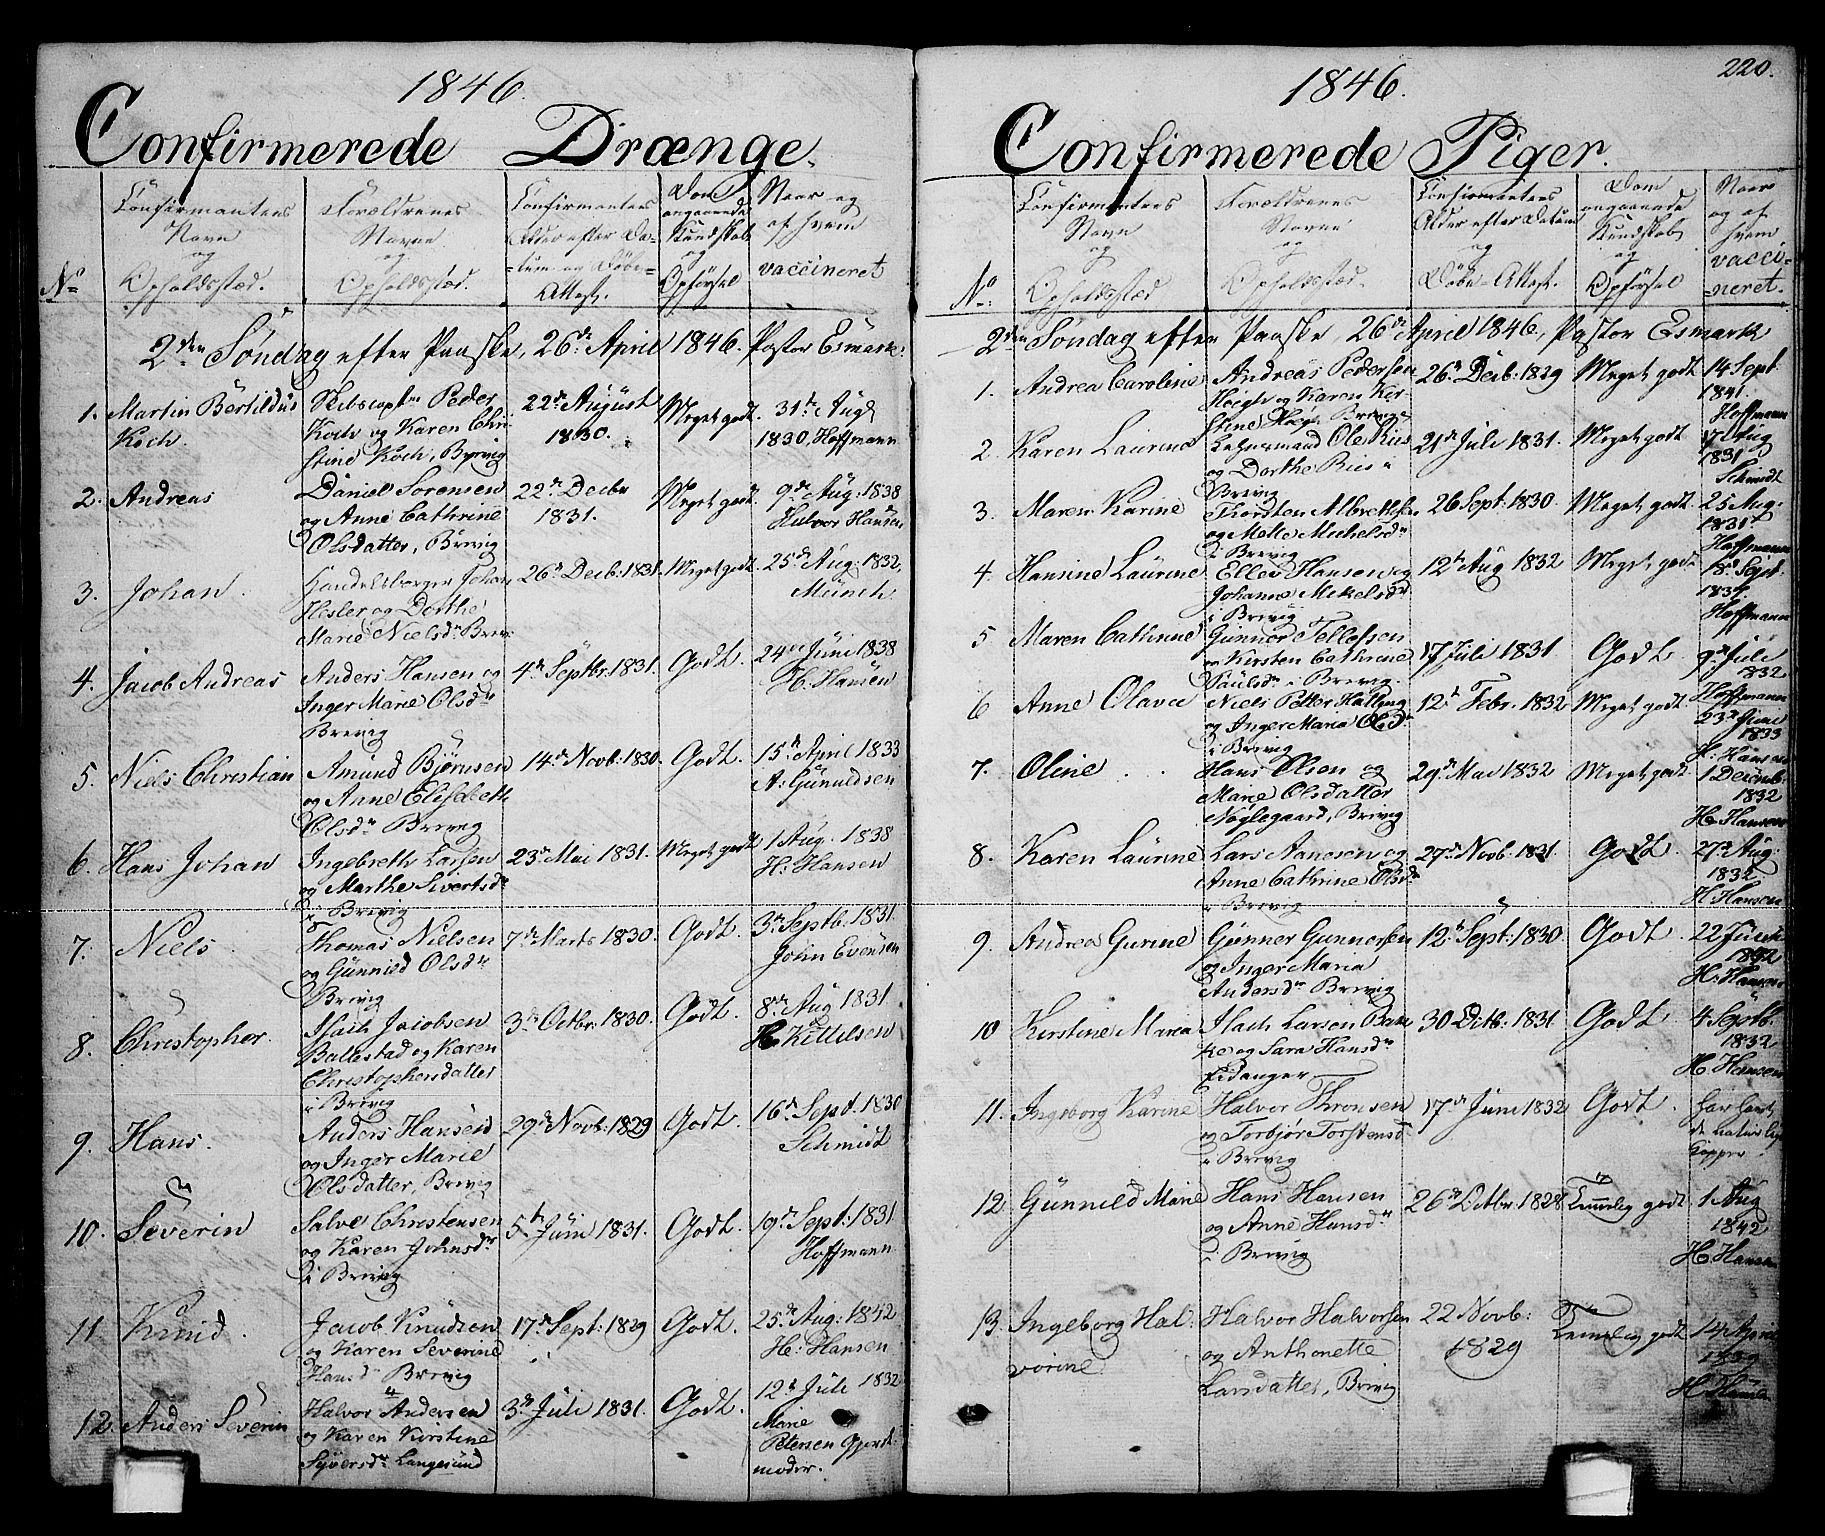 SAKO, Brevik kirkebøker, G/Ga/L0002: Klokkerbok nr. 2, 1846-1865, s. 220